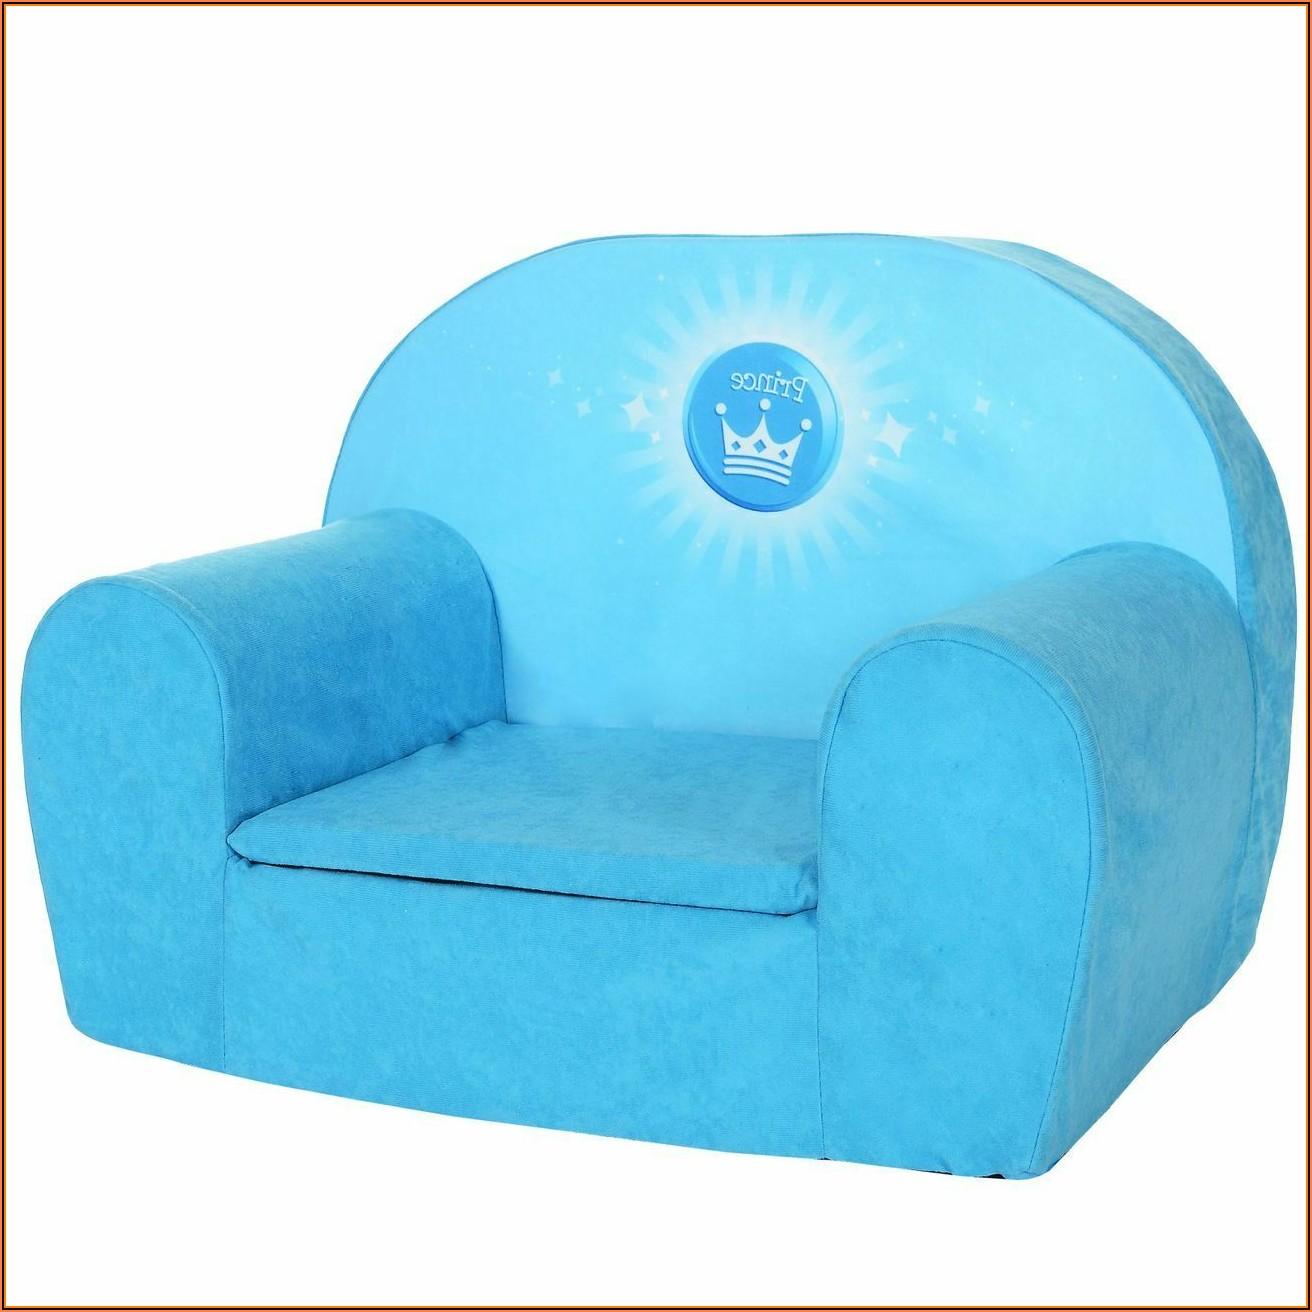 Mini Sofa Kinderzimmer